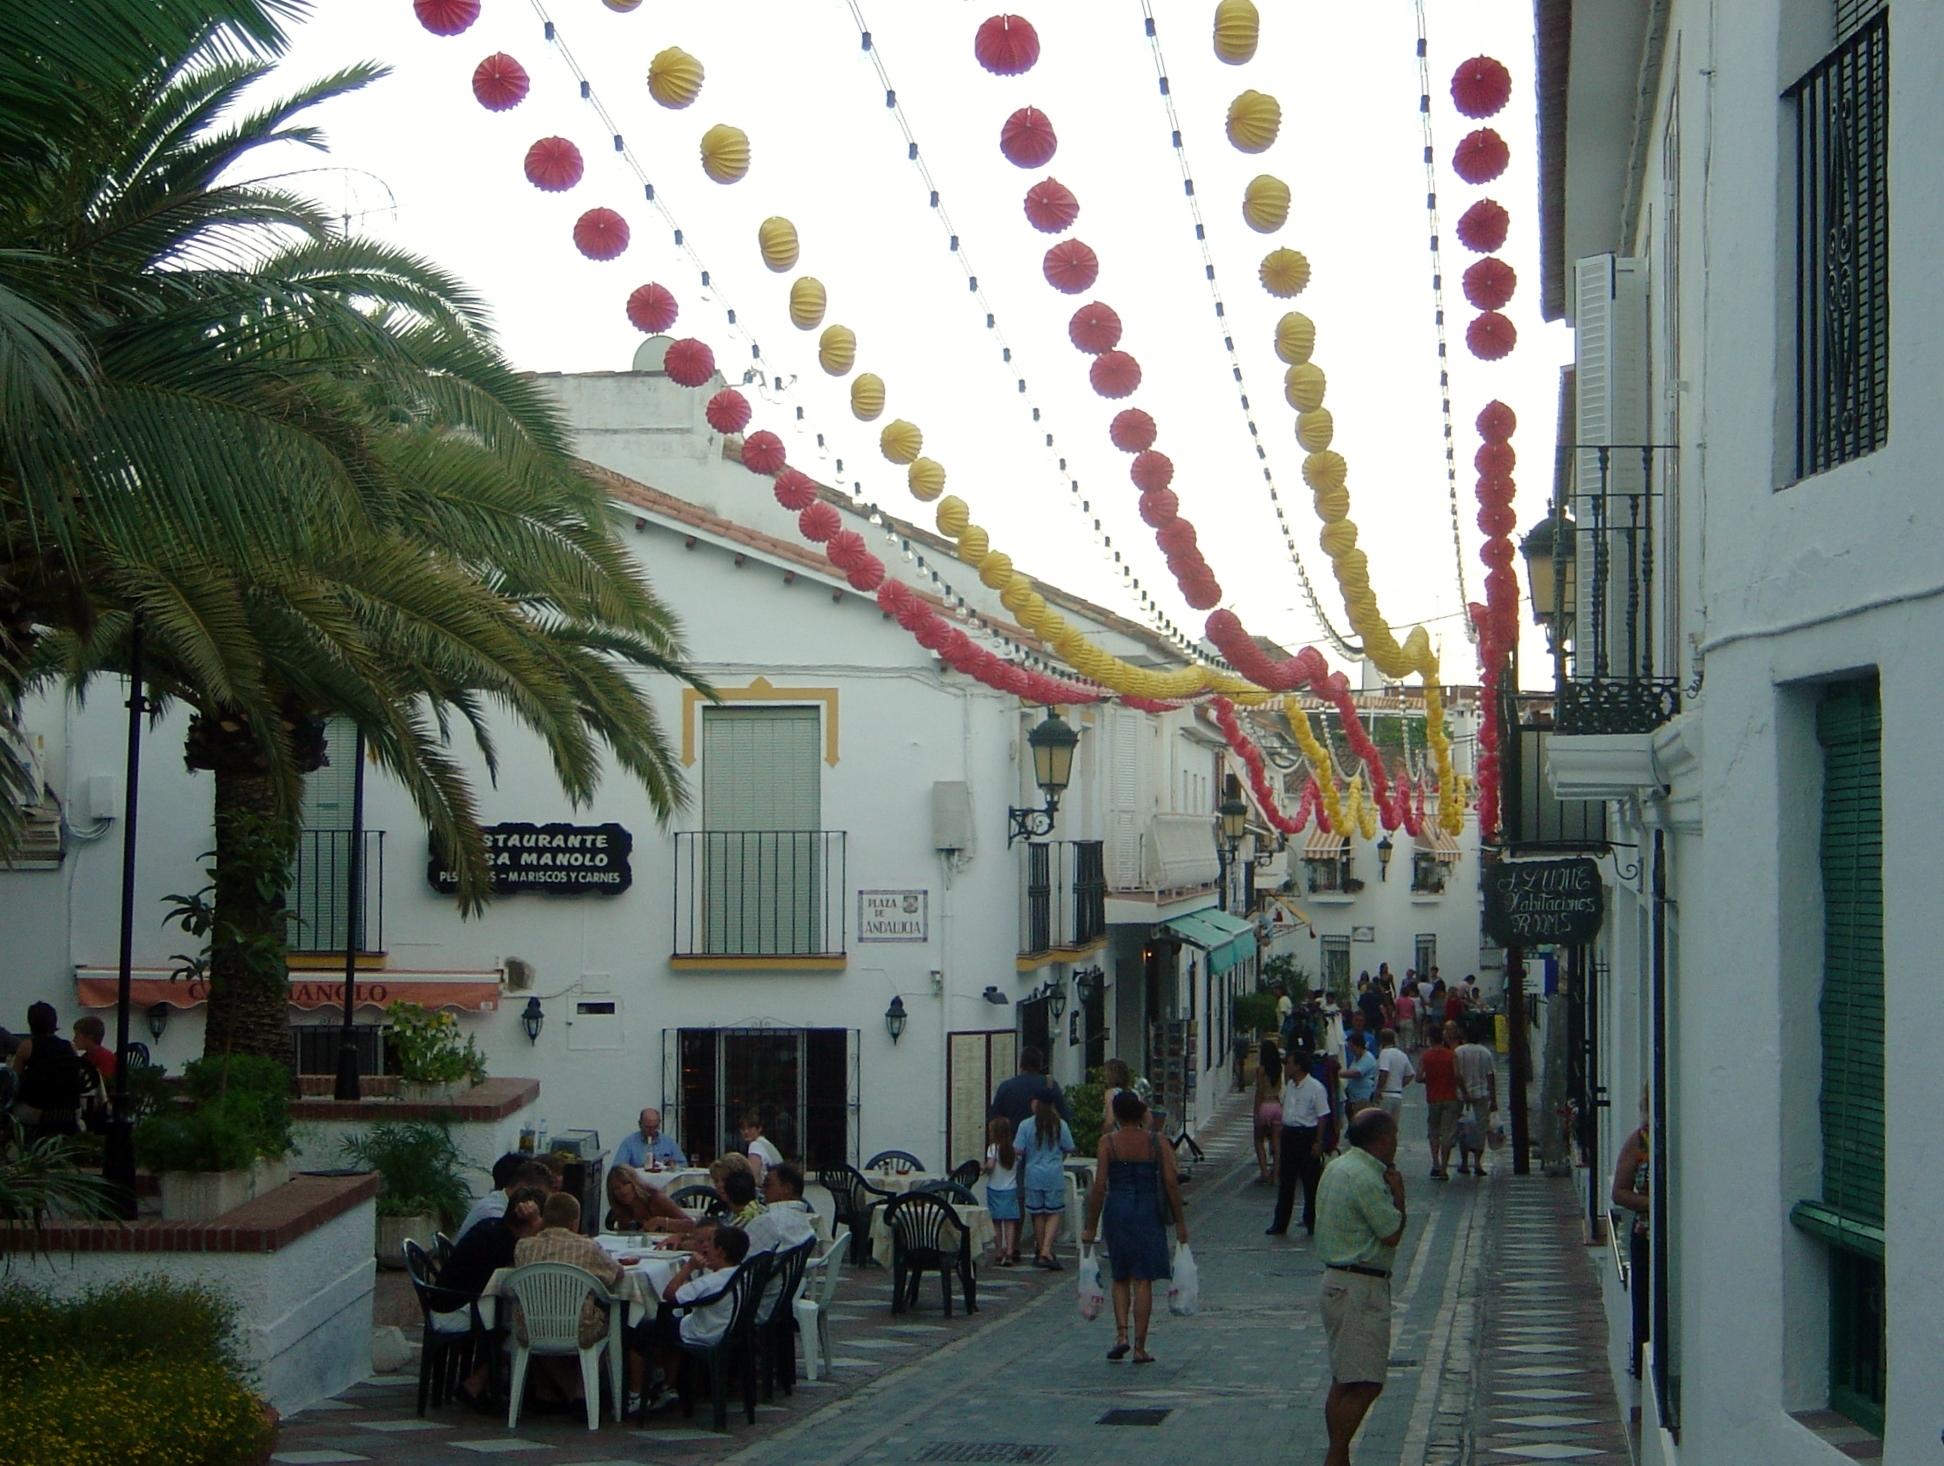 File:Benalmádena pueblo jpg - Wikimedia Commons